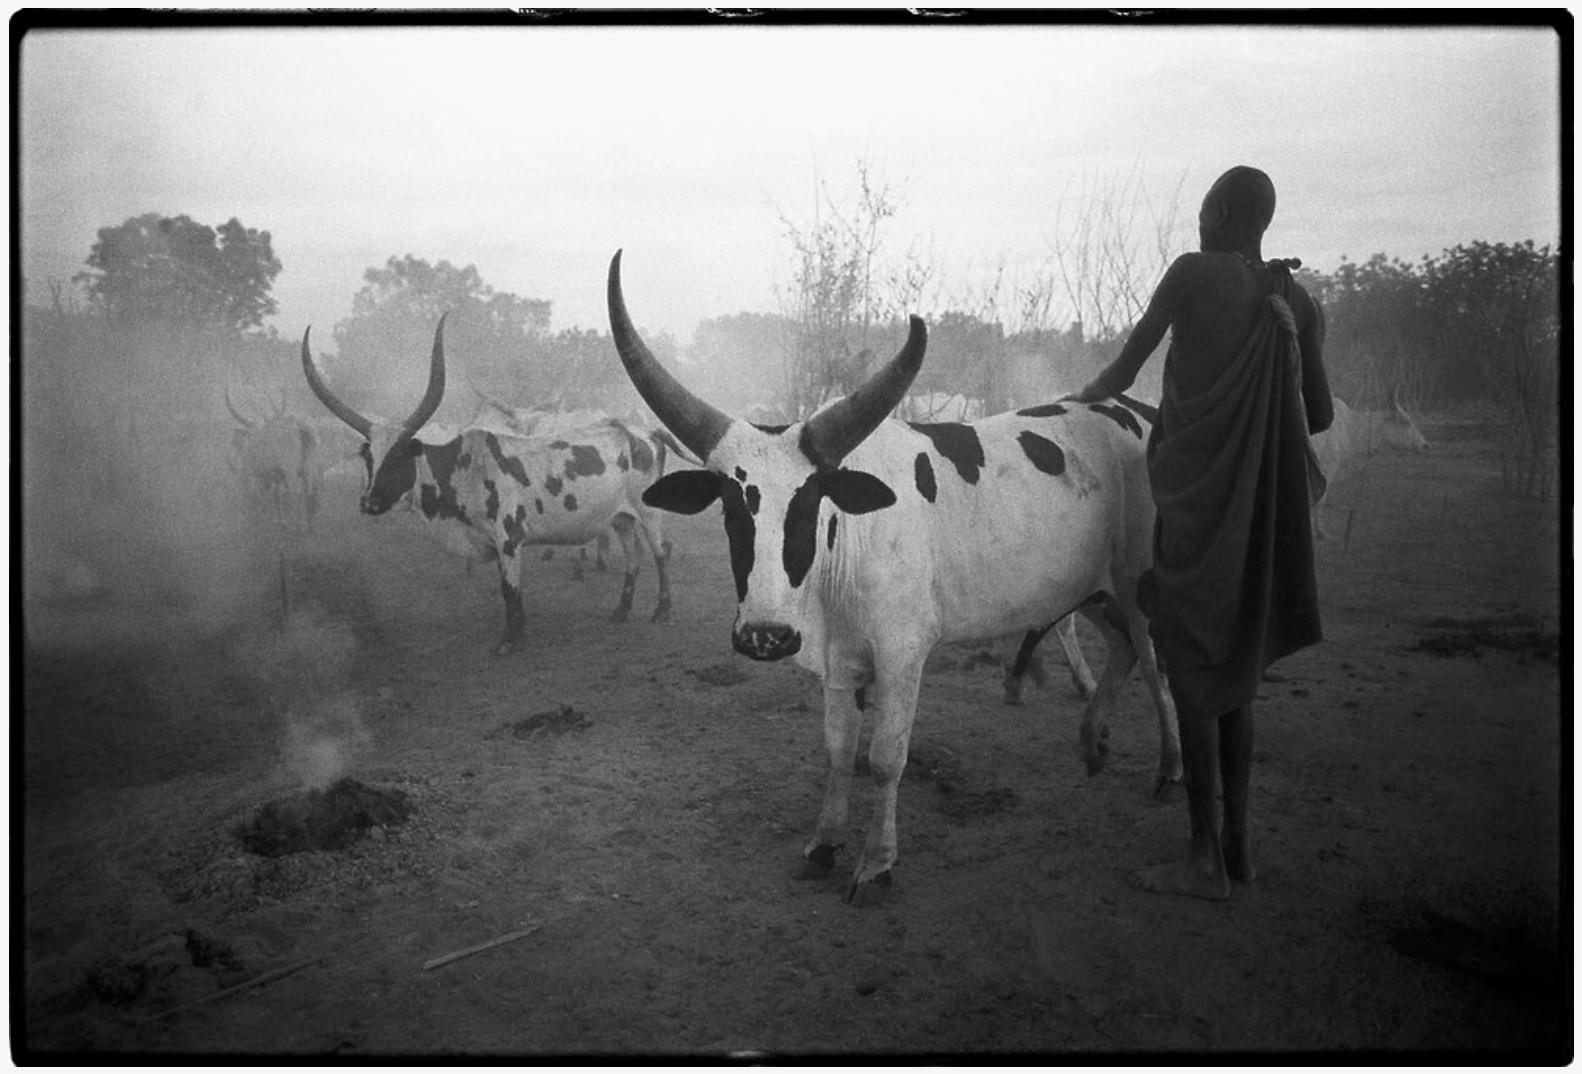 Southern Sudan 1989